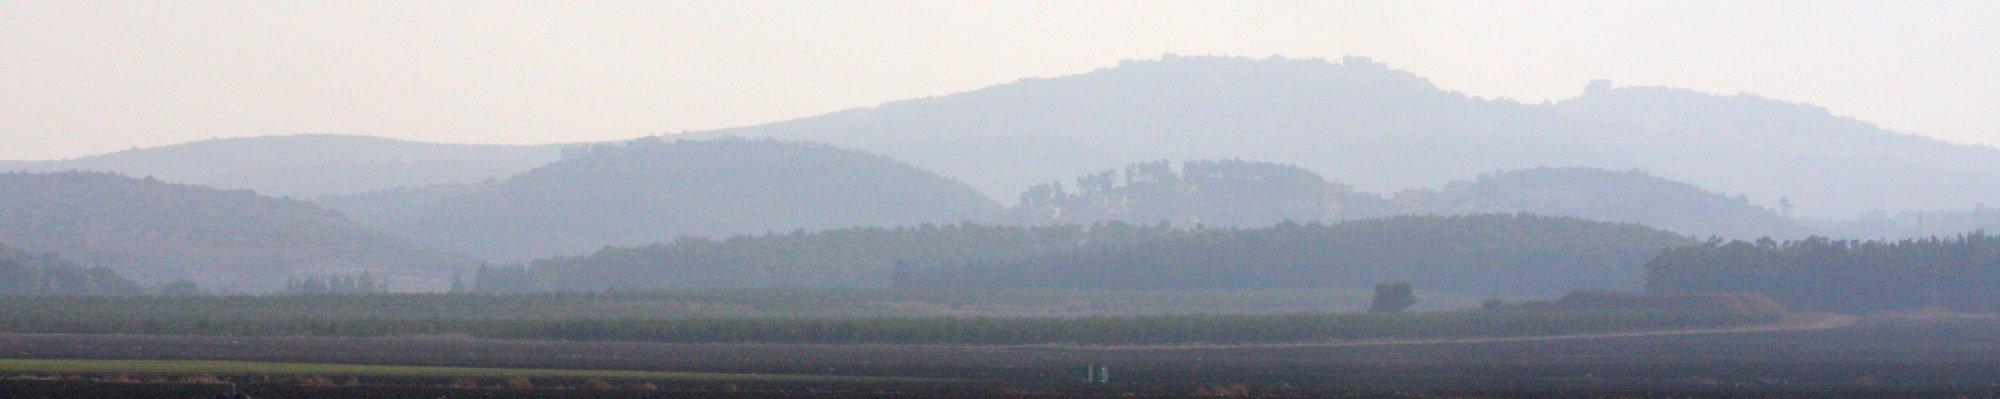 siltaisraeliin.org